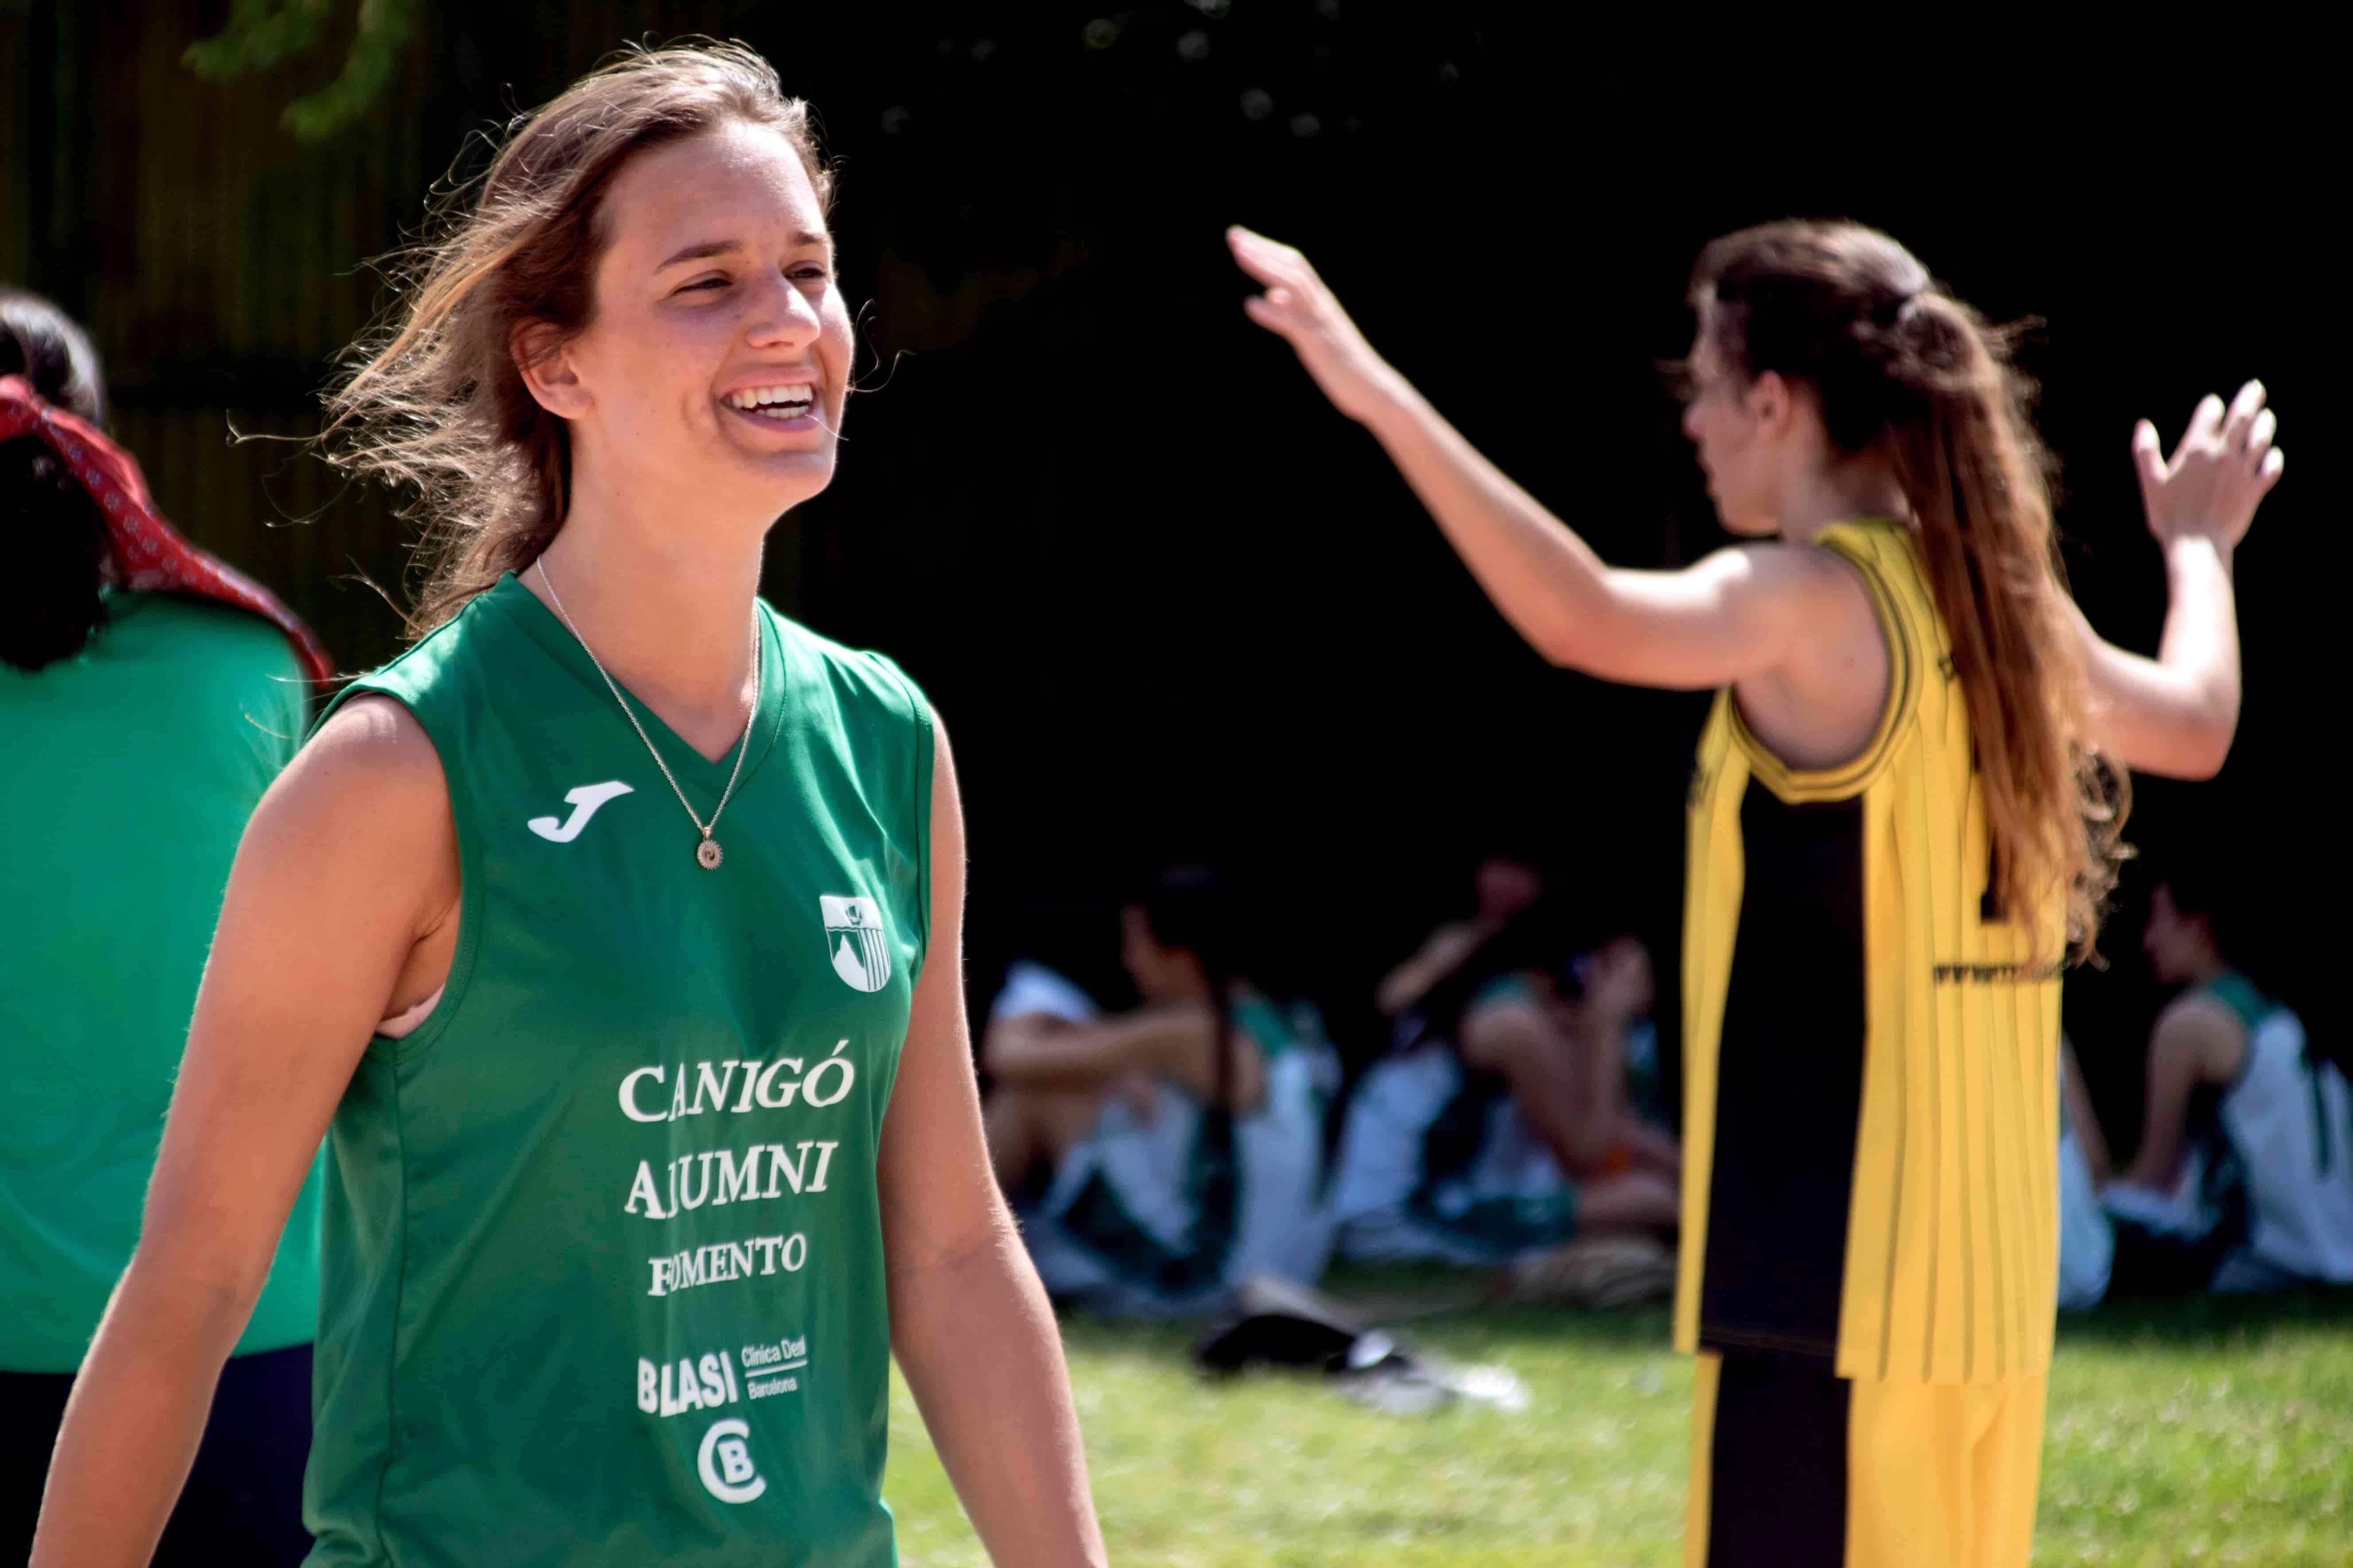 Torneo deportivo Fomento Alumni 29/06/2019 canigó